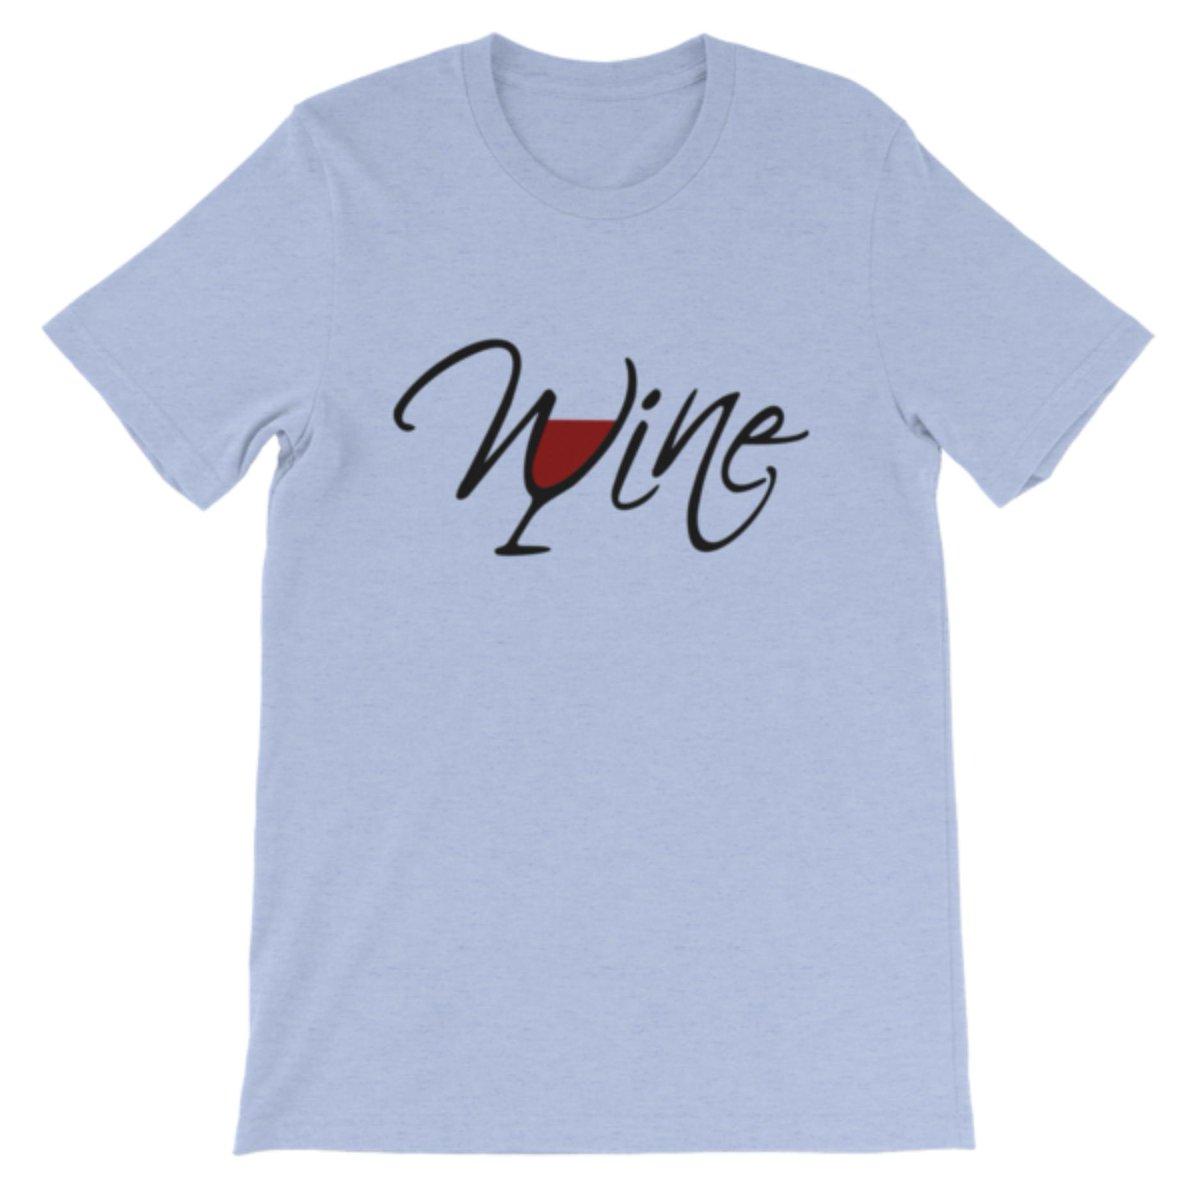 #NationalDrinkWineDay! . https://t.co/EyH63WOSII . . #allographictees #wine #winelife #winelifestyle #winelove #winelover #winelovers #redwine #whitewine #rosé #vin #vino #winenight #winestyle https://t.co/NfjvqCOy64